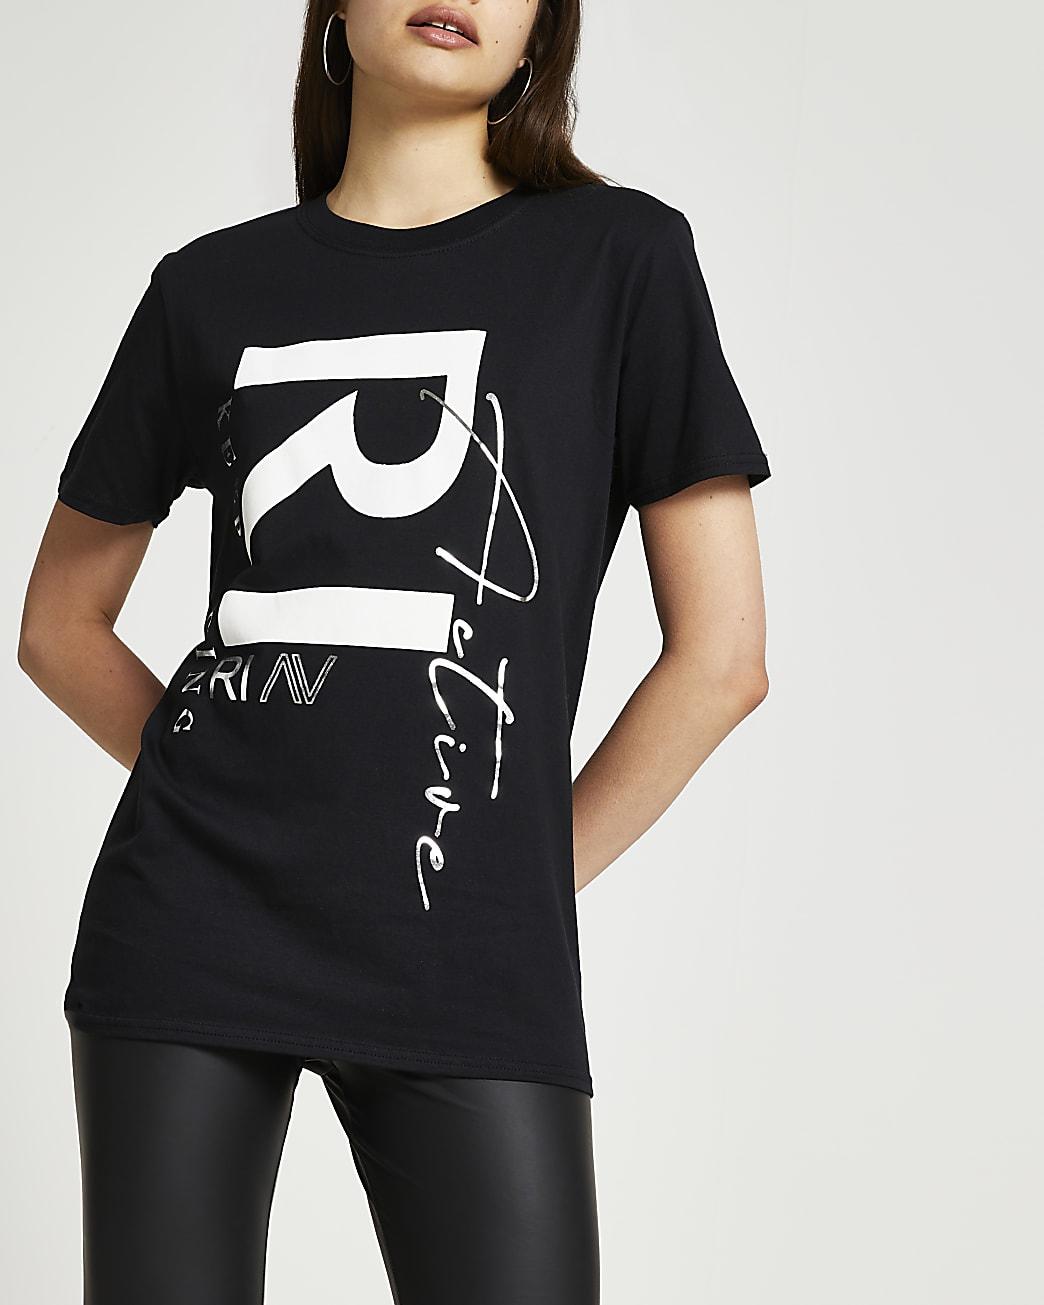 Black RI Active boyfriend t-shirt